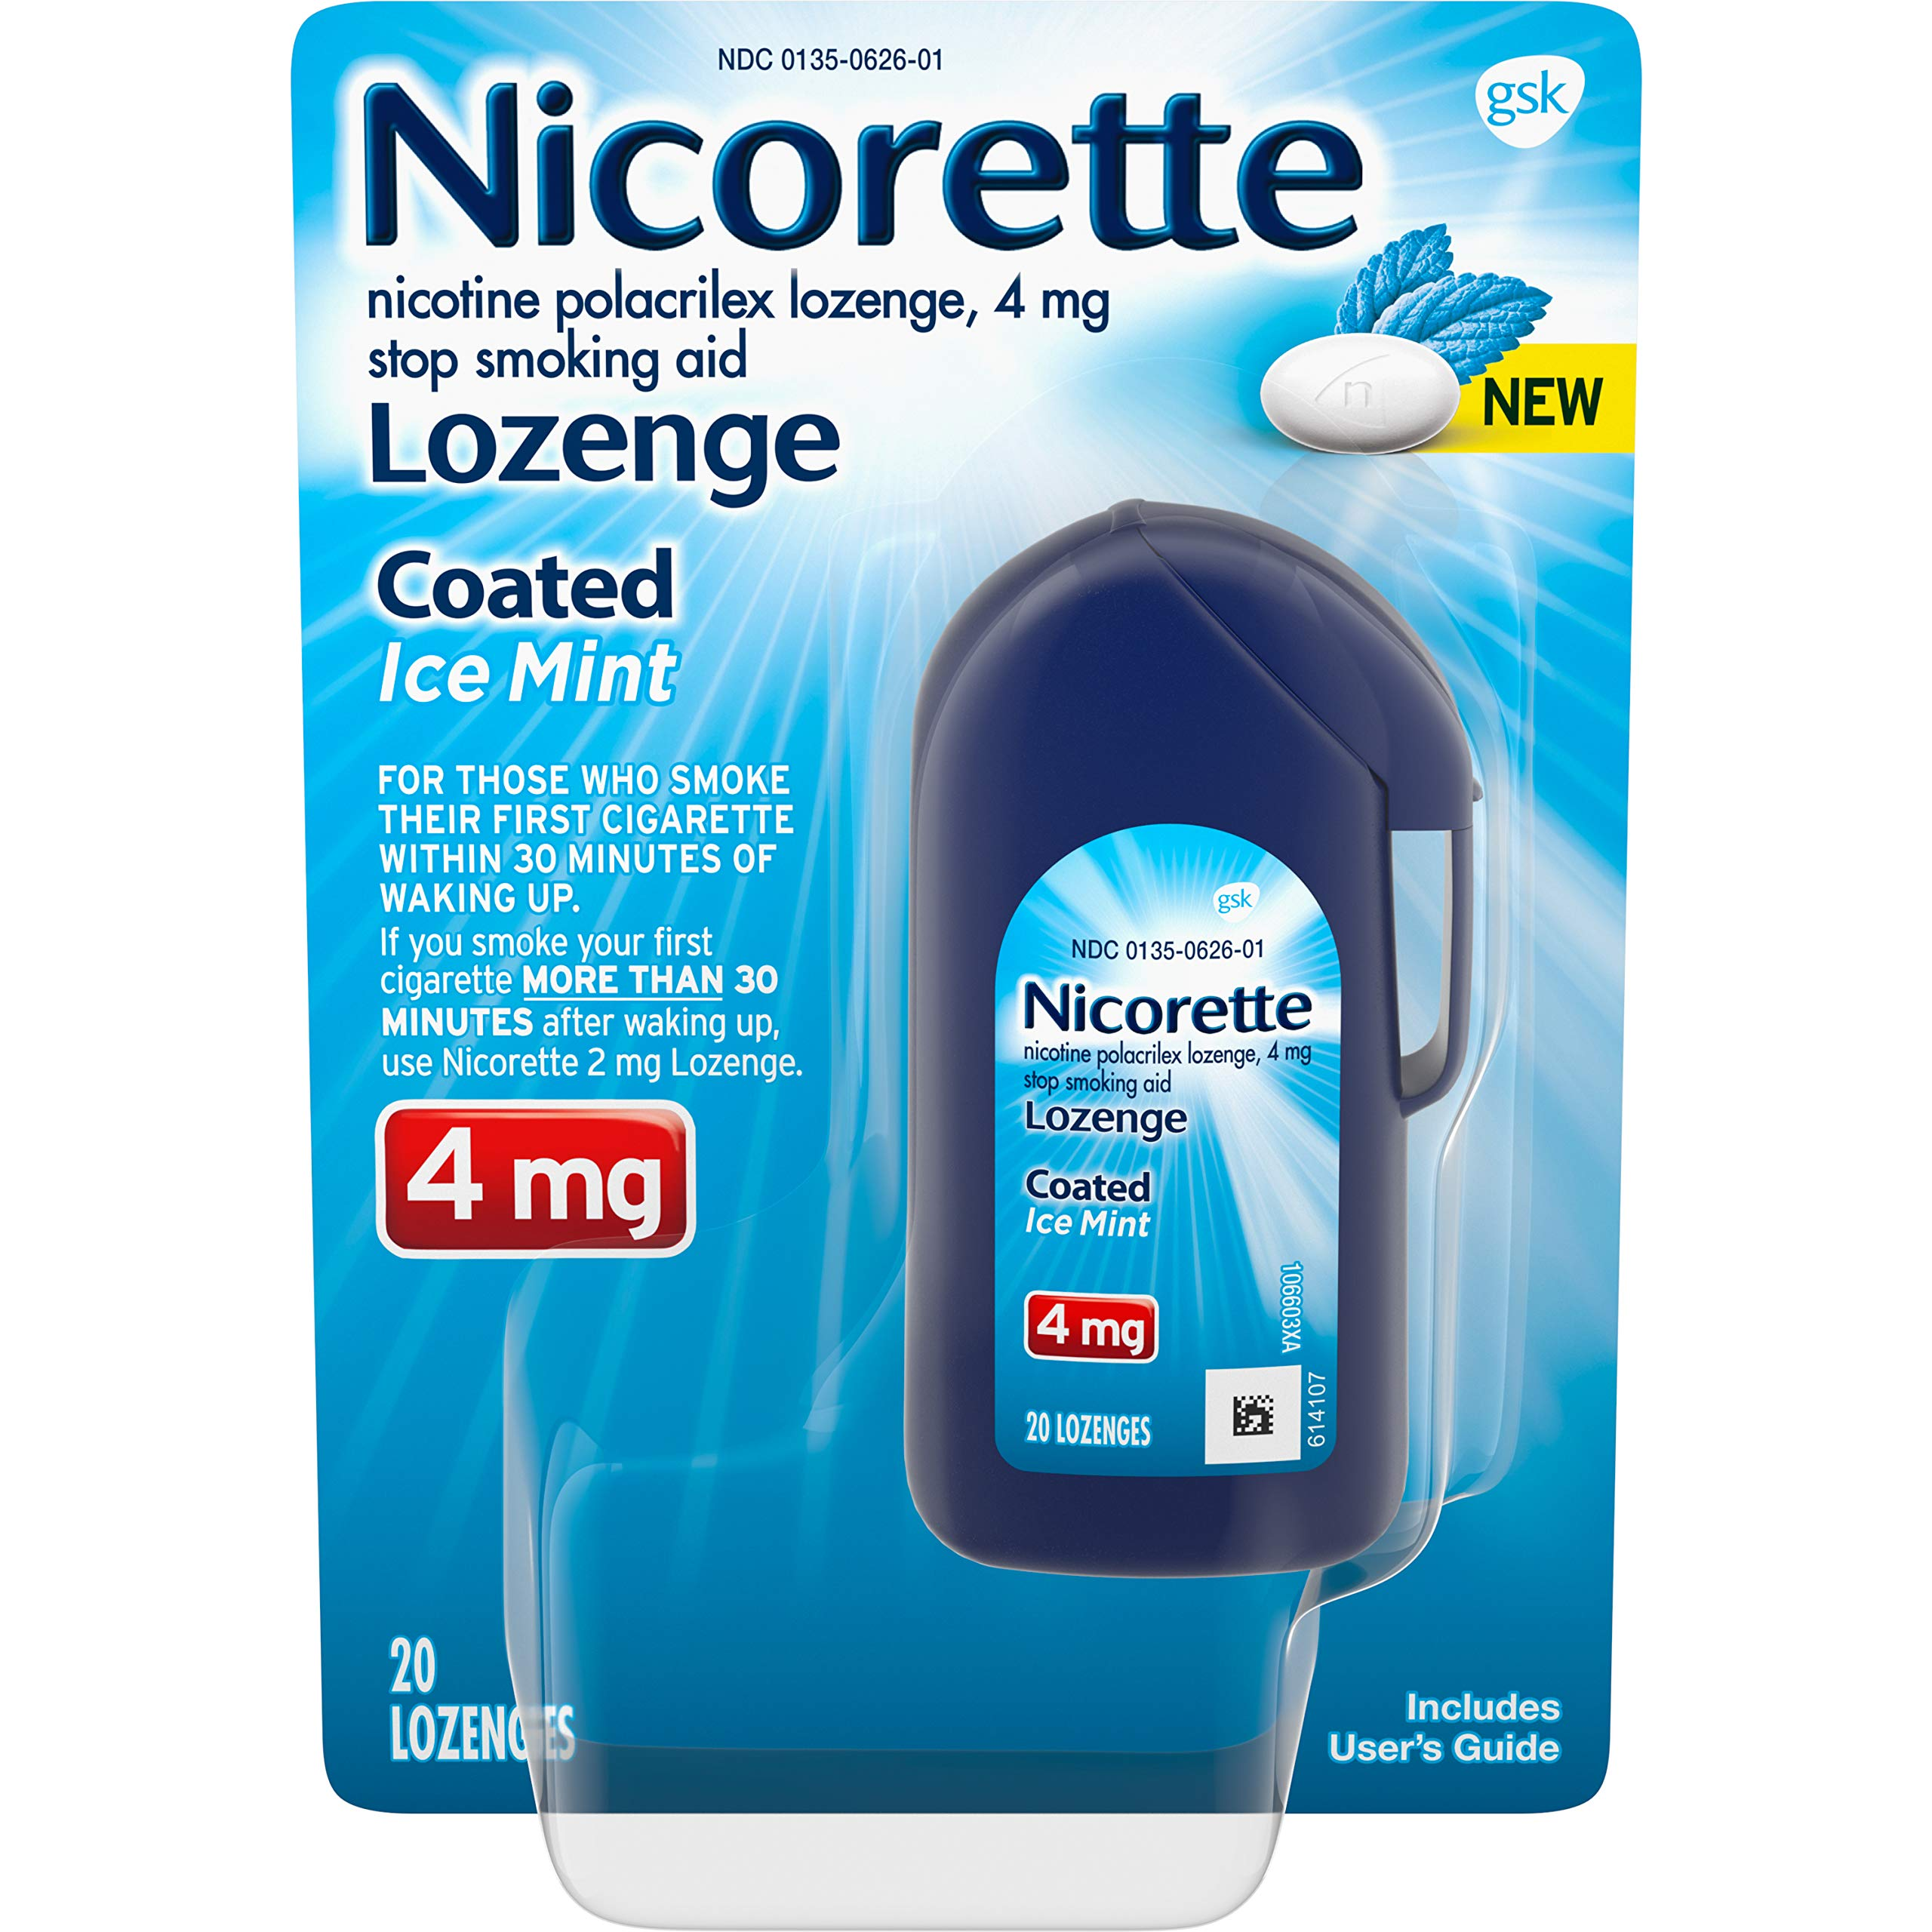 Nicorette Coated Nicotine Lozenge to Stop Smoking, 4 Mg, Ice Mint, 20Count